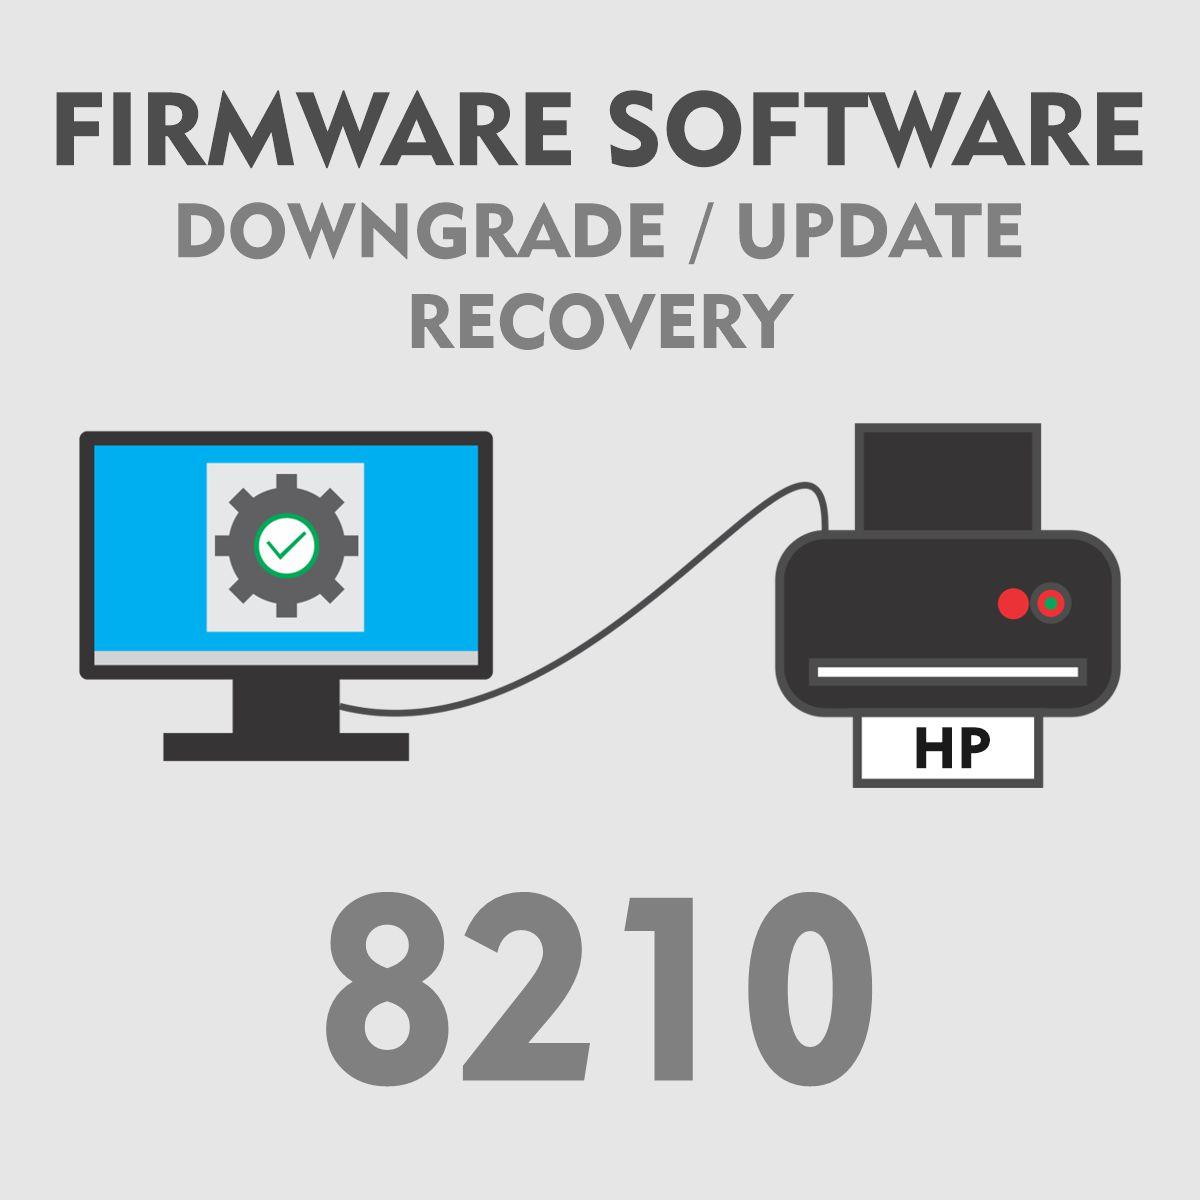 HP 8210 | Software Firmware para Downgrade Update Recovery